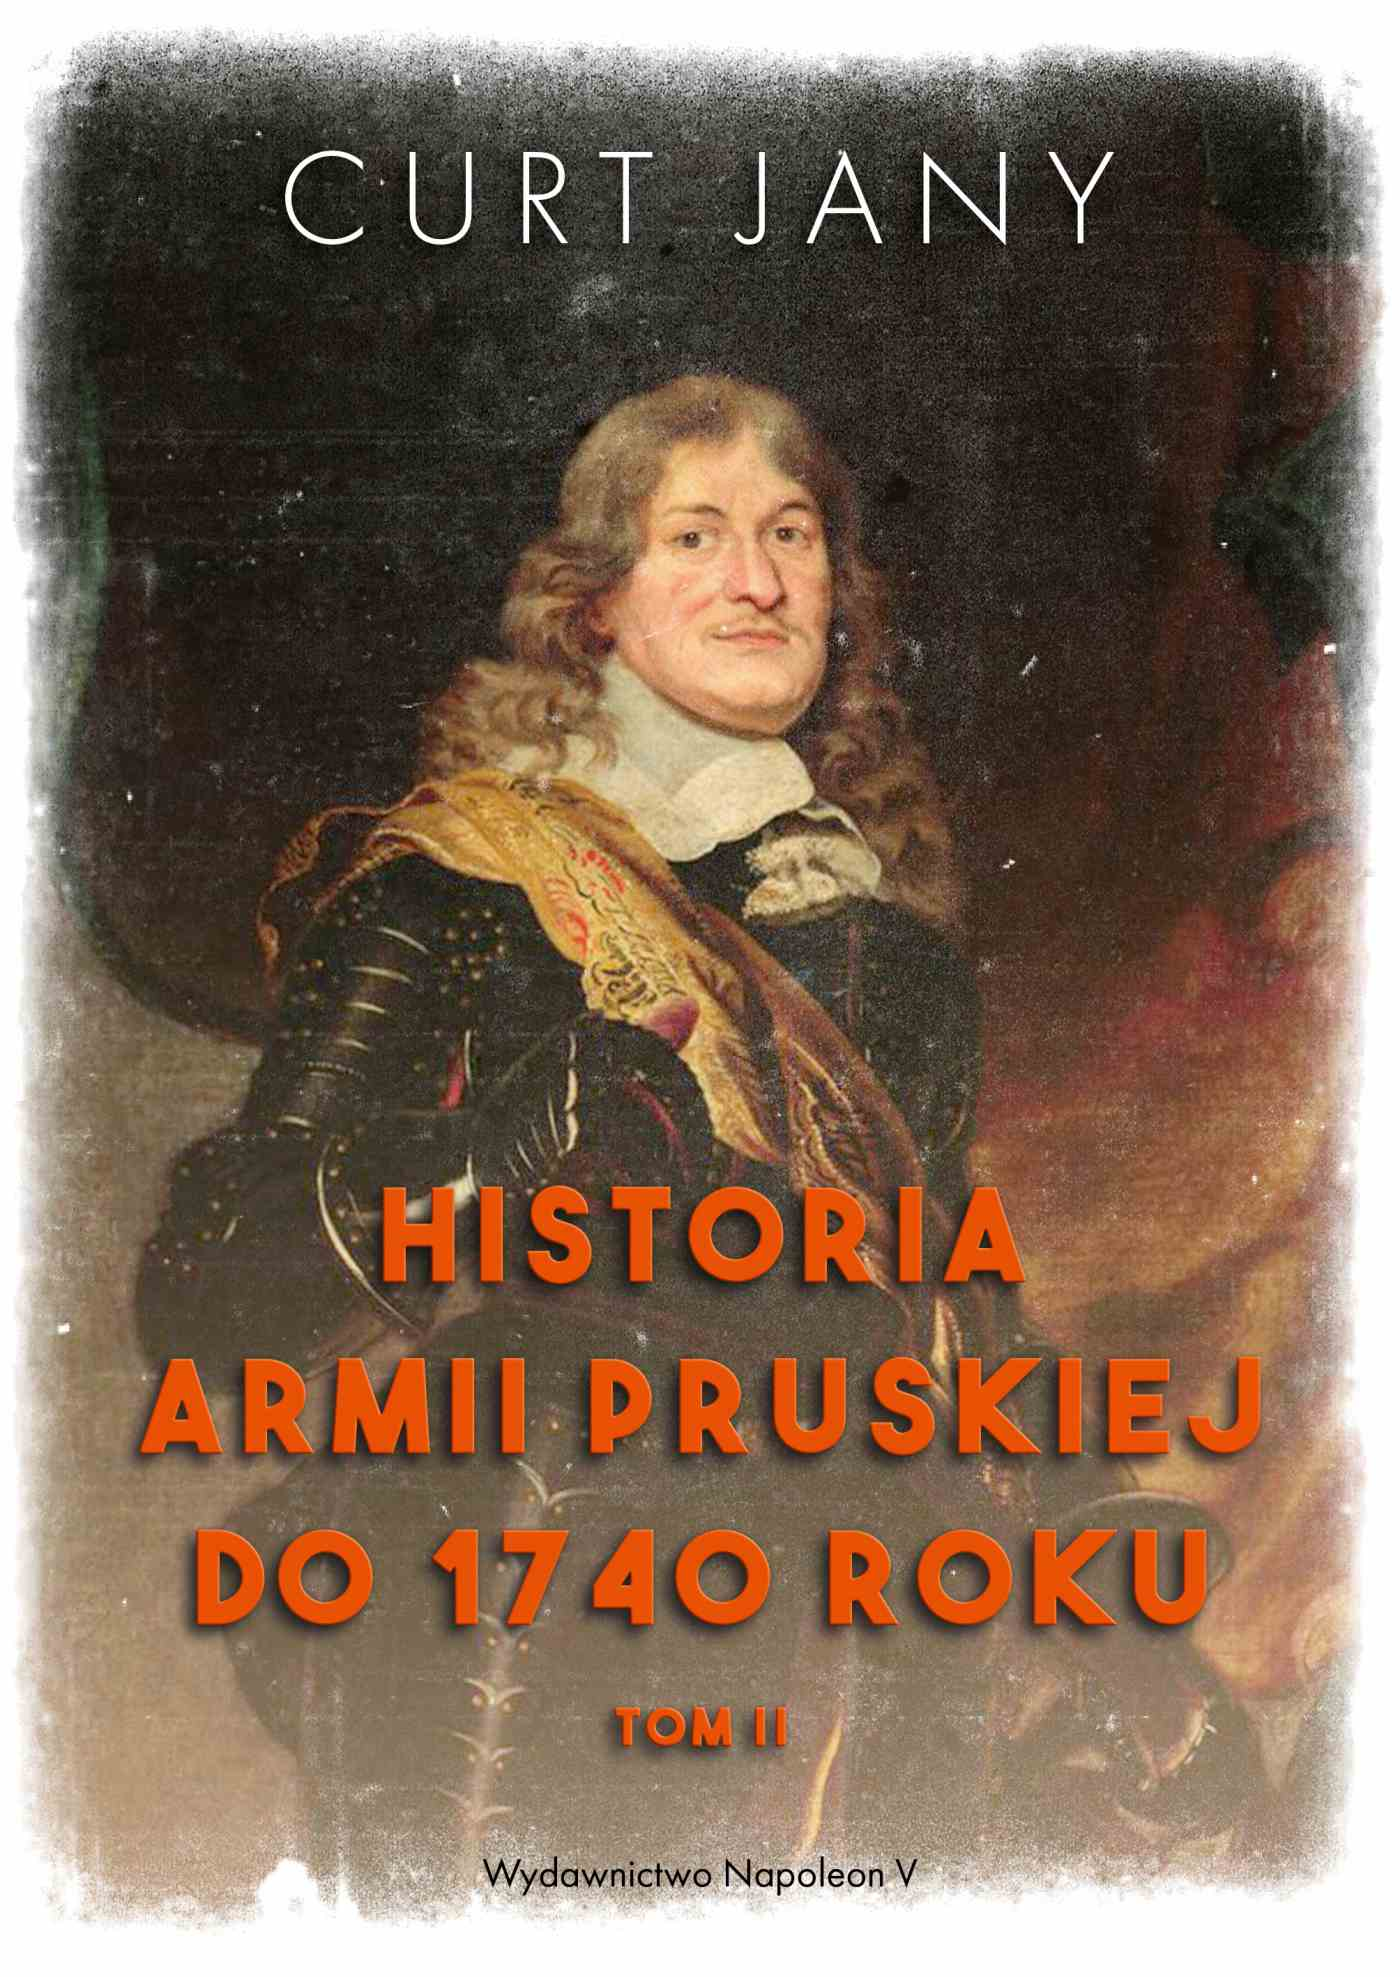 Historia armii pruskiej do 1740 roku. Tom 2 - Ebook (Książka EPUB) do pobrania w formacie EPUB